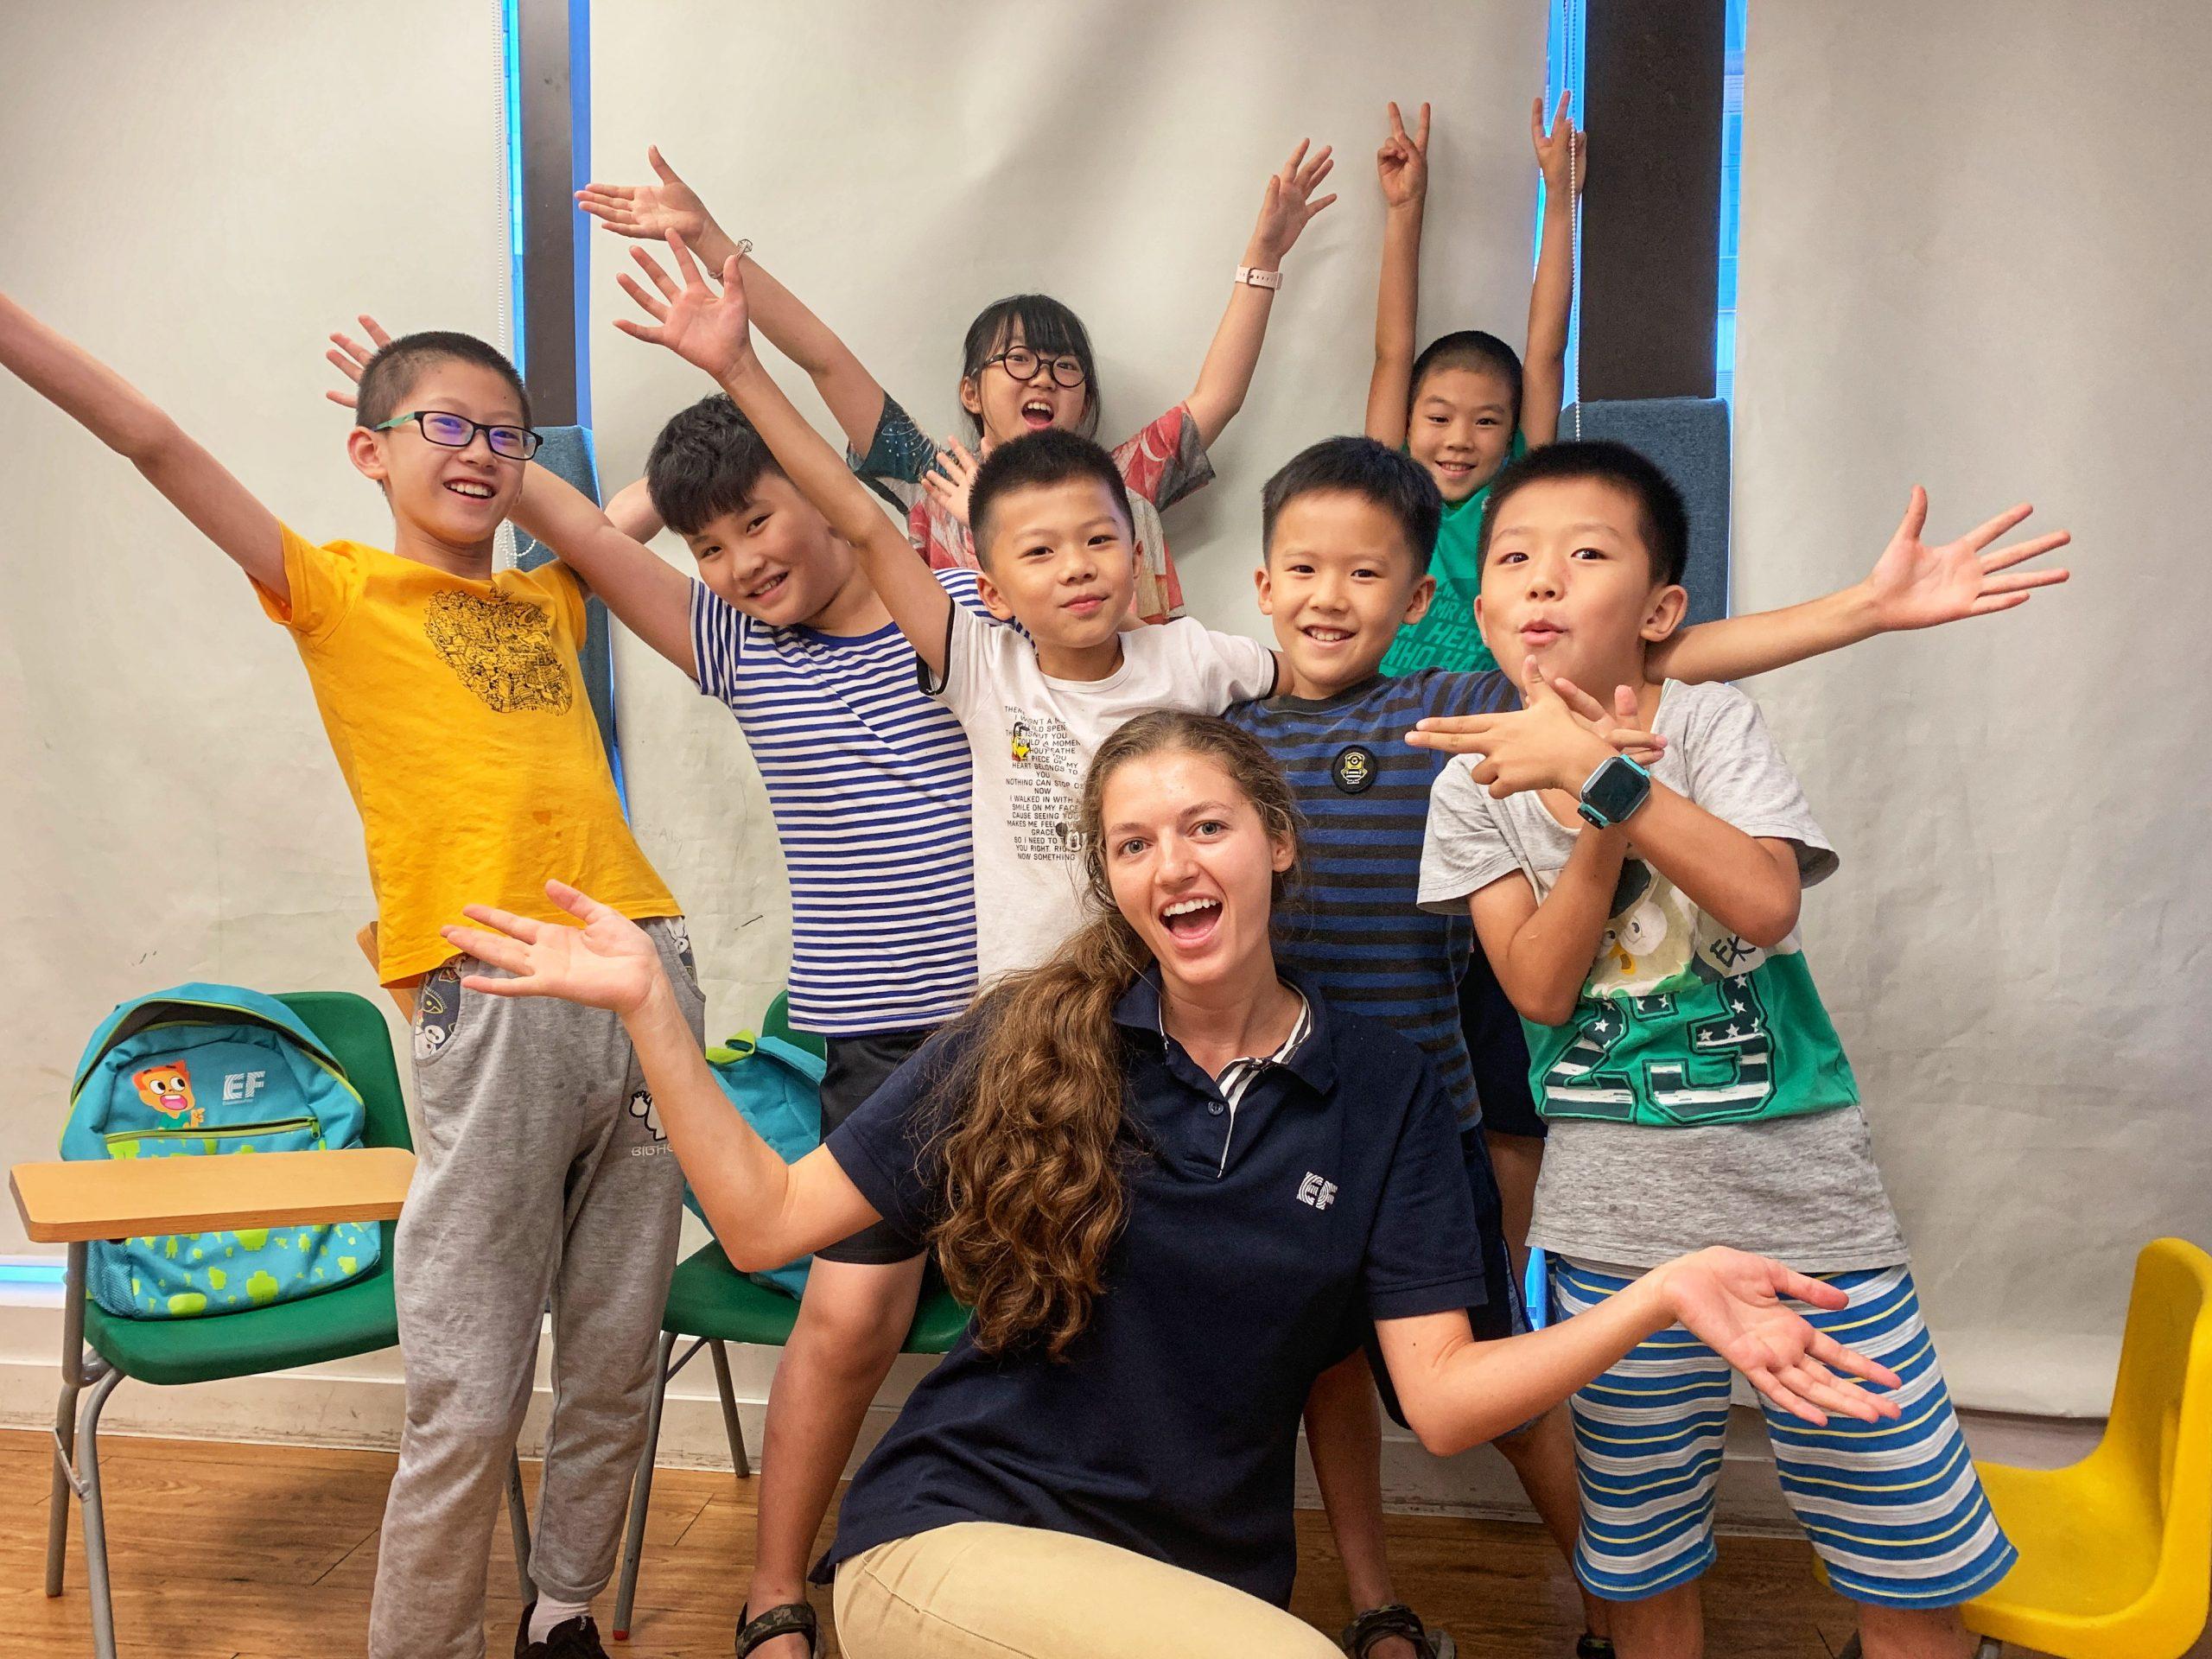 TEFL teacher Britanny with her students